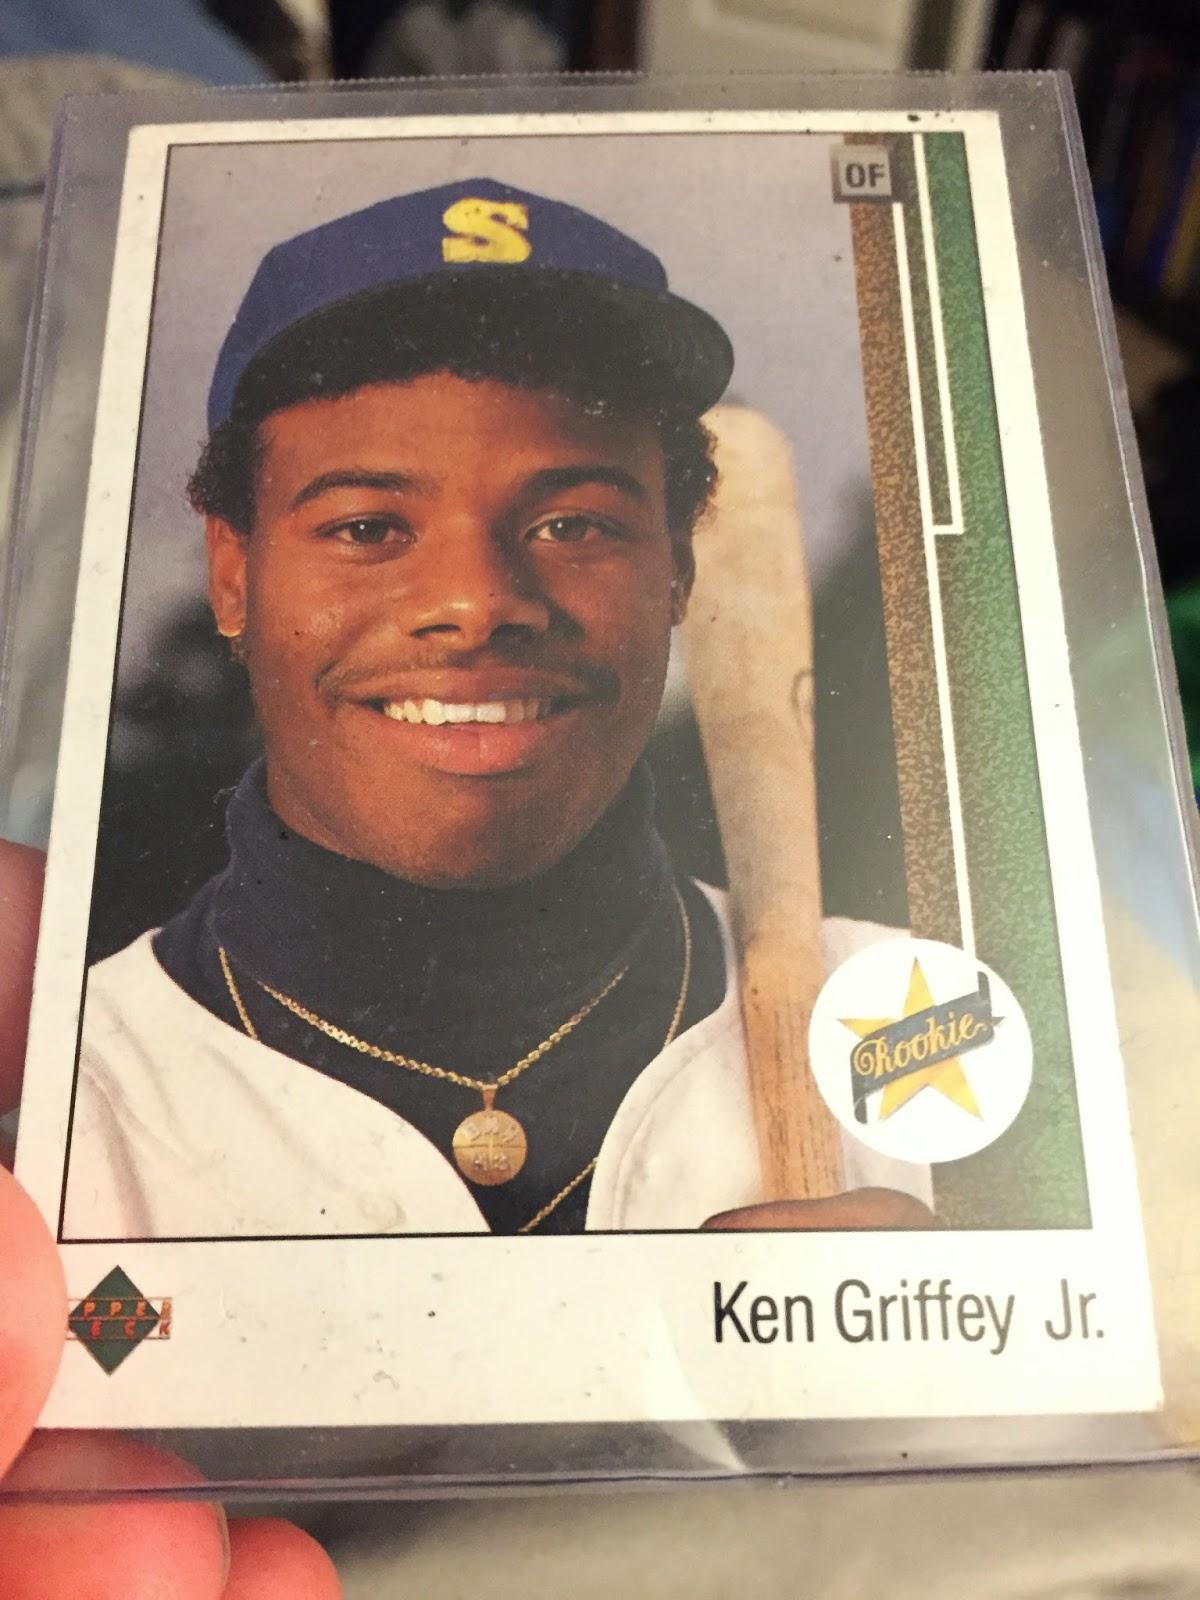 Ken griffey jr chubby